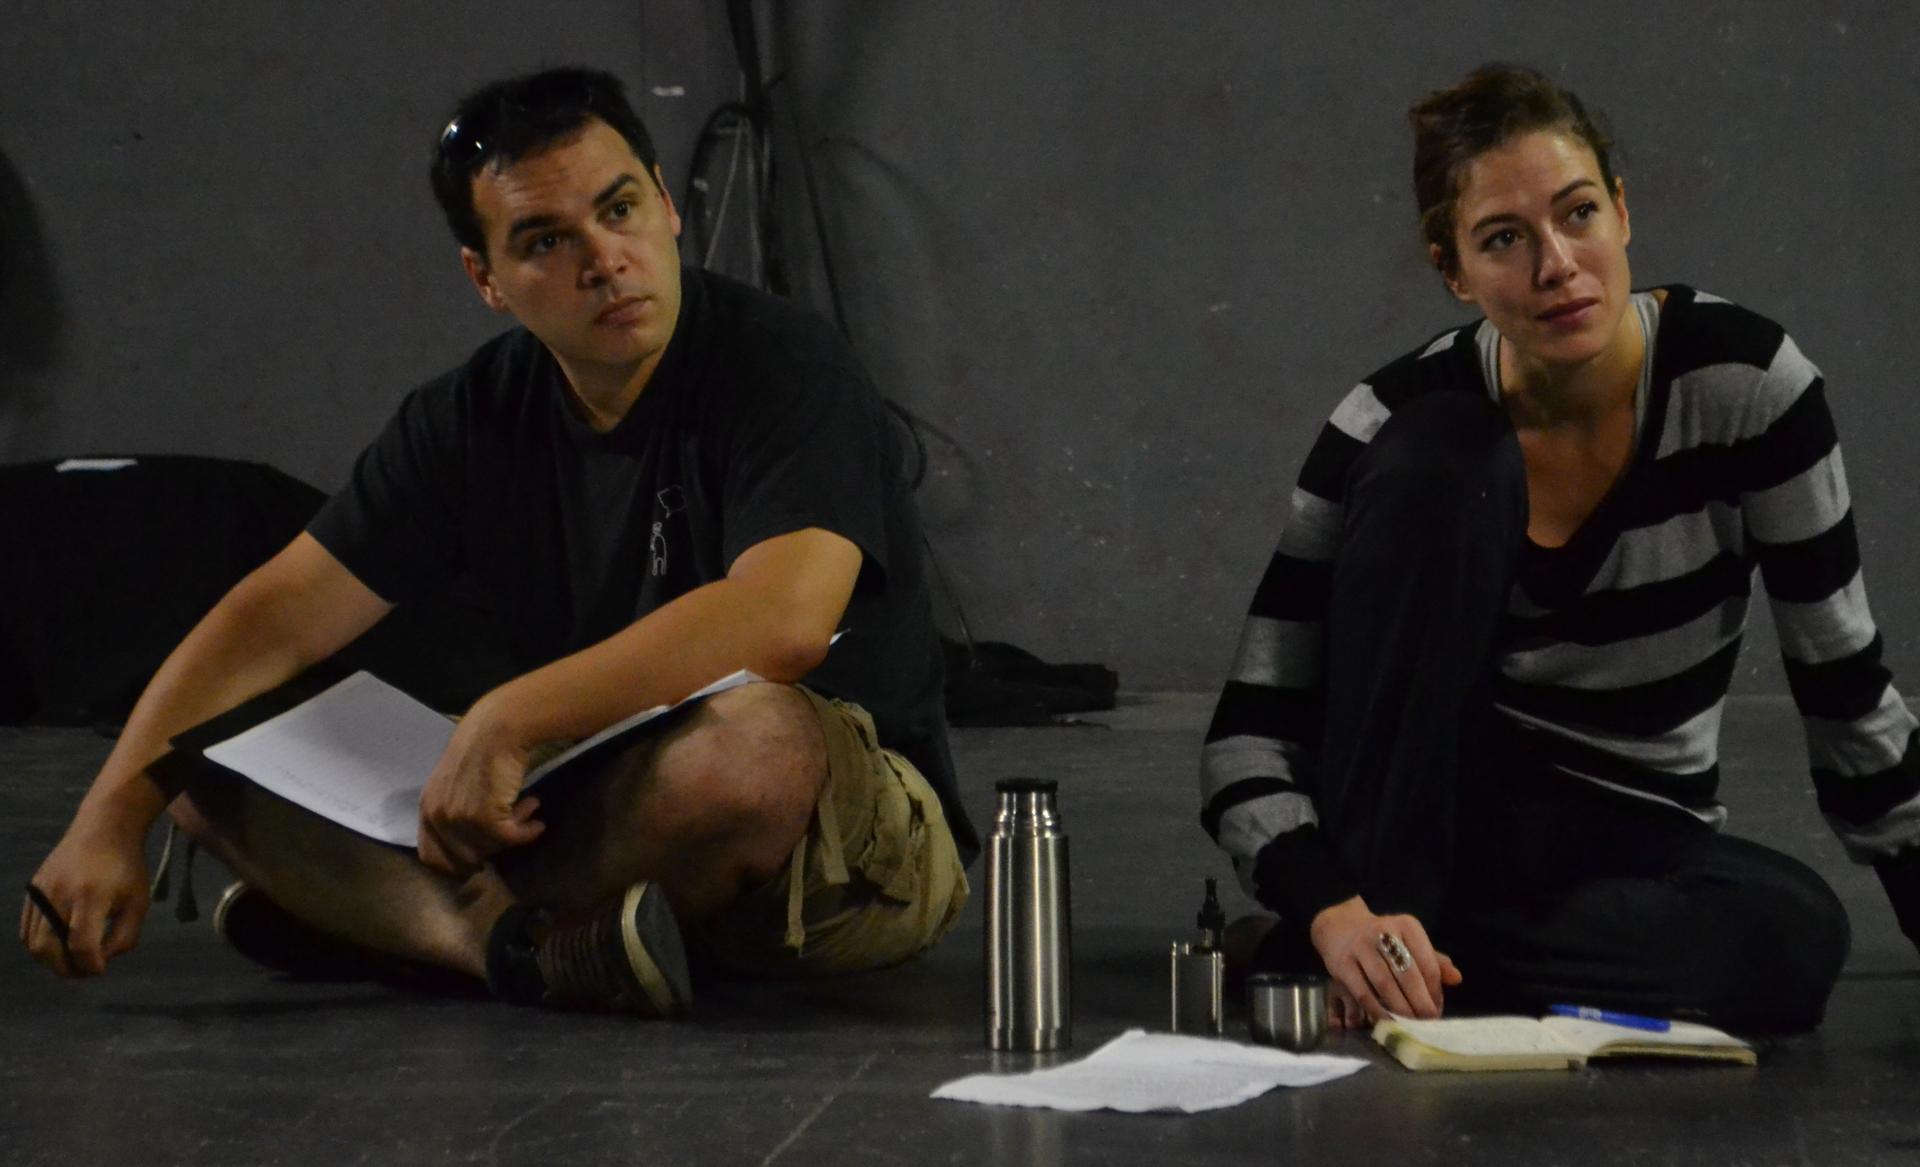 Aurélien Zolli & Marianne Masson